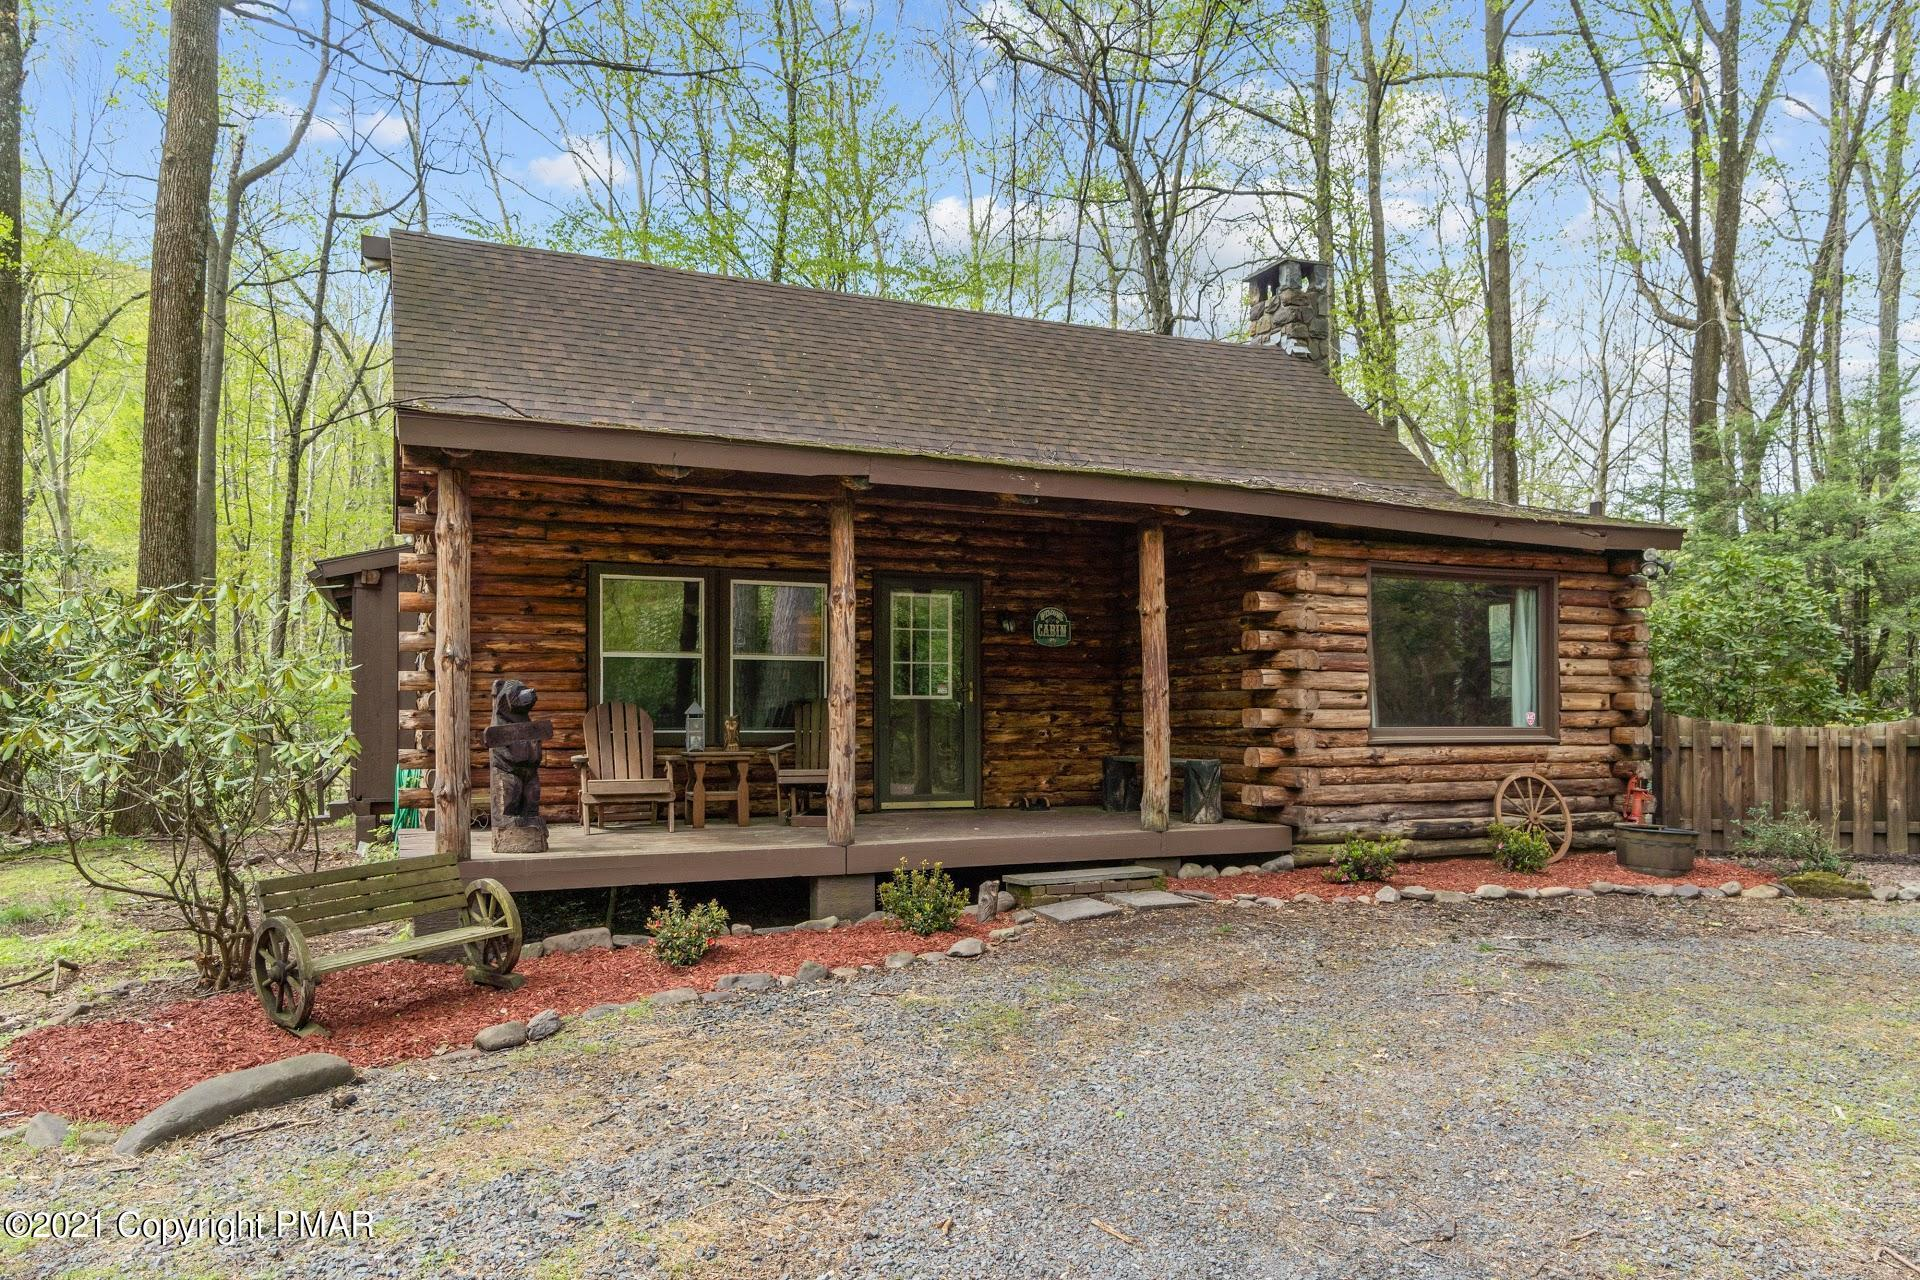 225 Camelback Rd, Tannersville, PA 18372